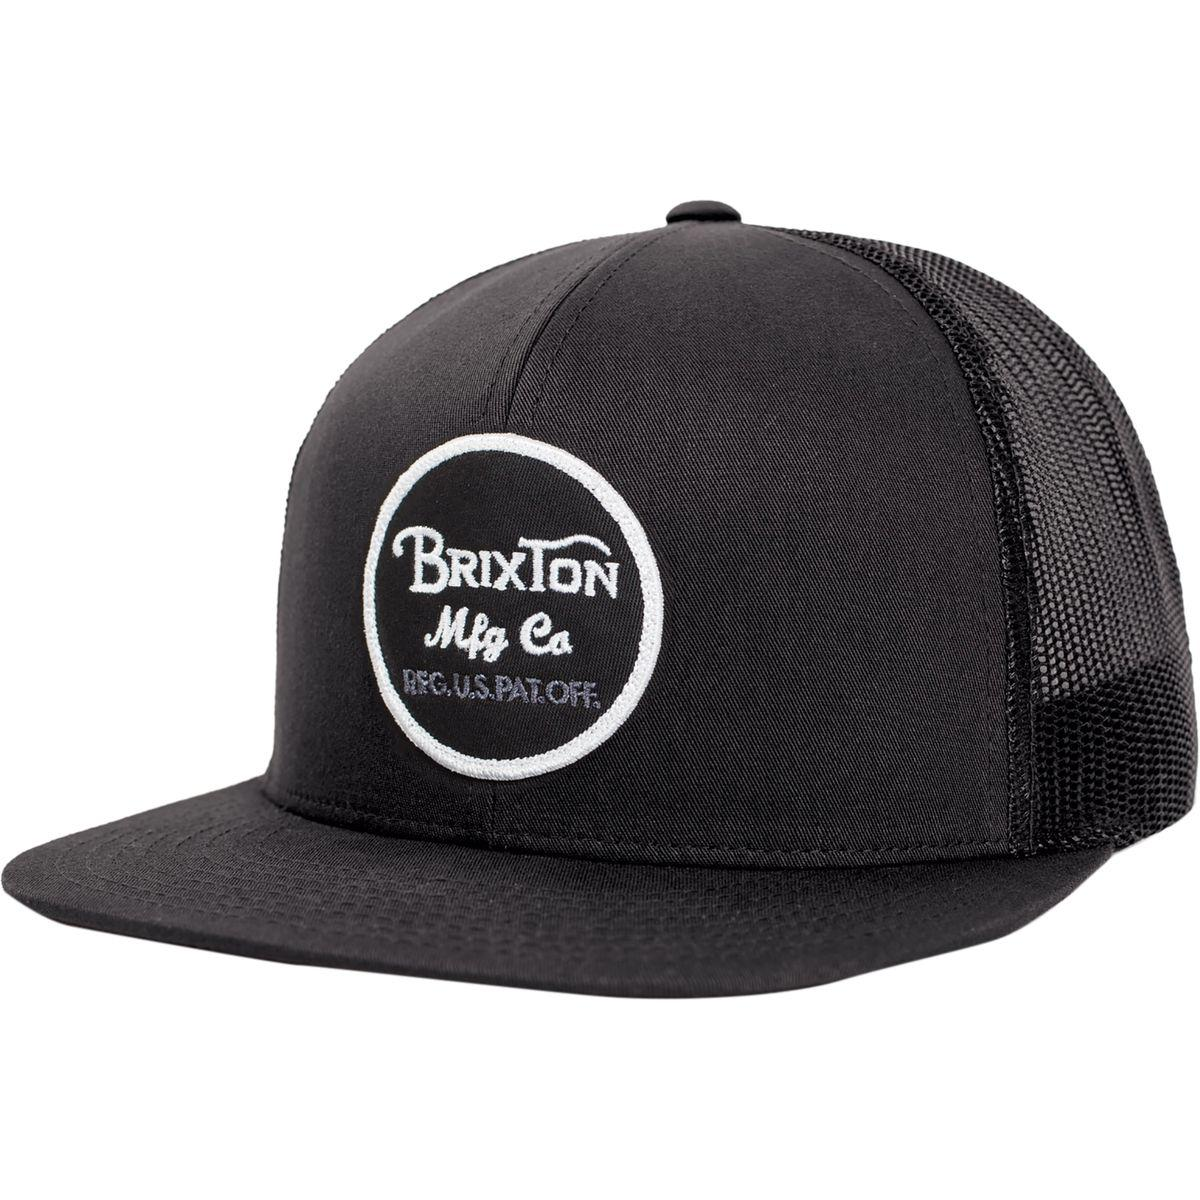 c1fd5a18469 Brixton - Black Wheeler Mesh Cap for Men - Lyst. View fullscreen